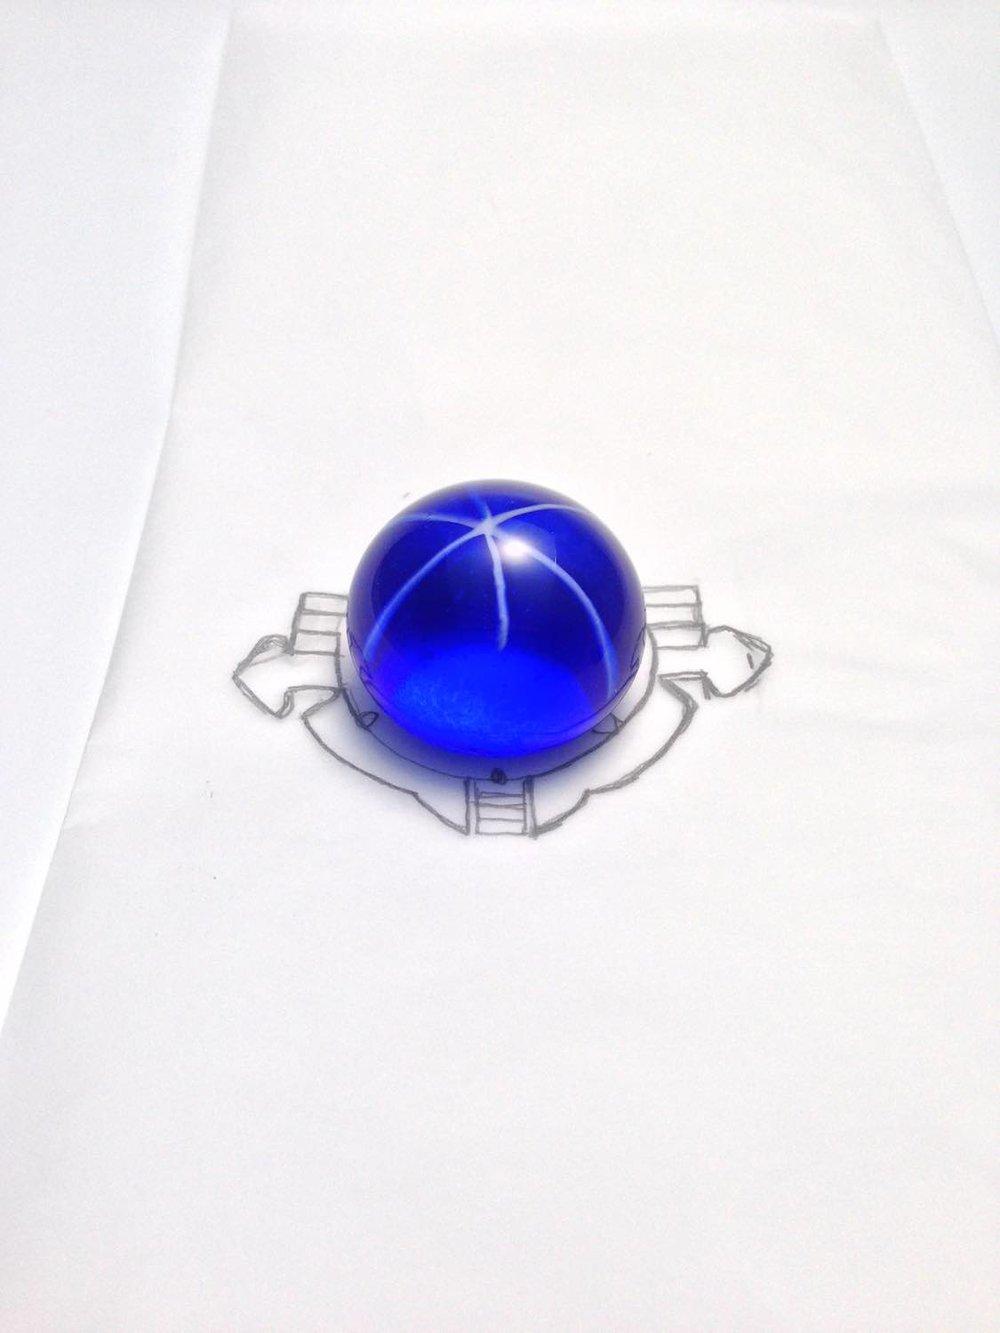 Carole Lombard Brooch-Kathleen Lynagh Designs (8).jpg